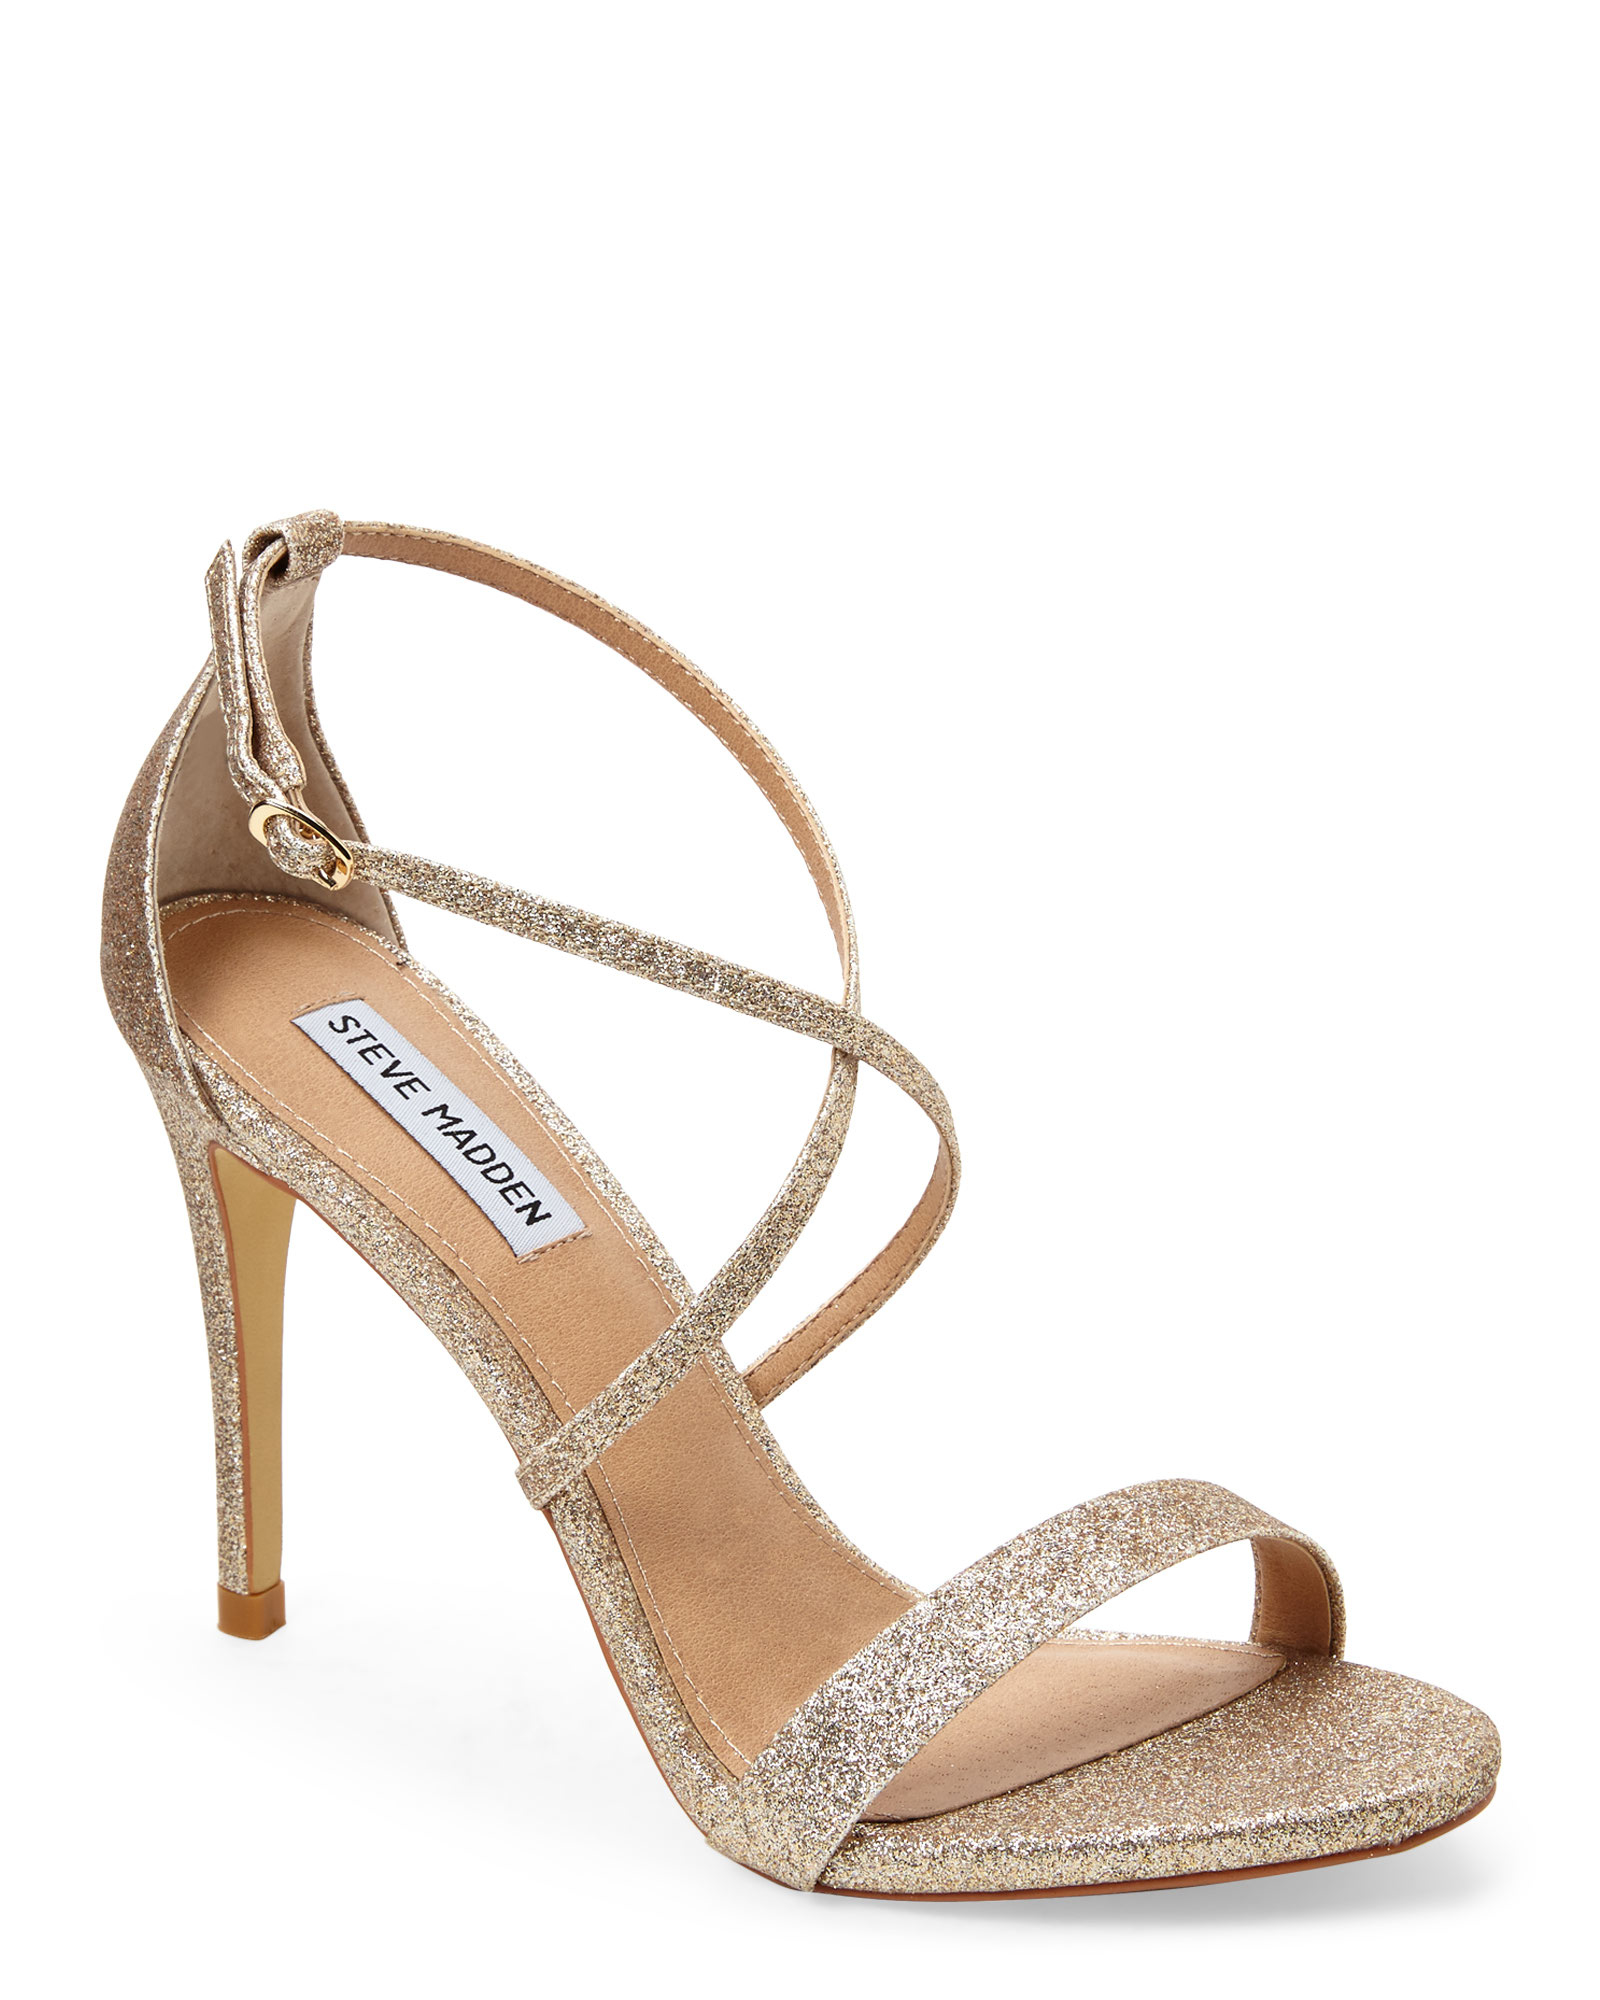 65f99c50cc1 Lyst - Steve Madden Gold Feliz Strappy Sandals in Metallic